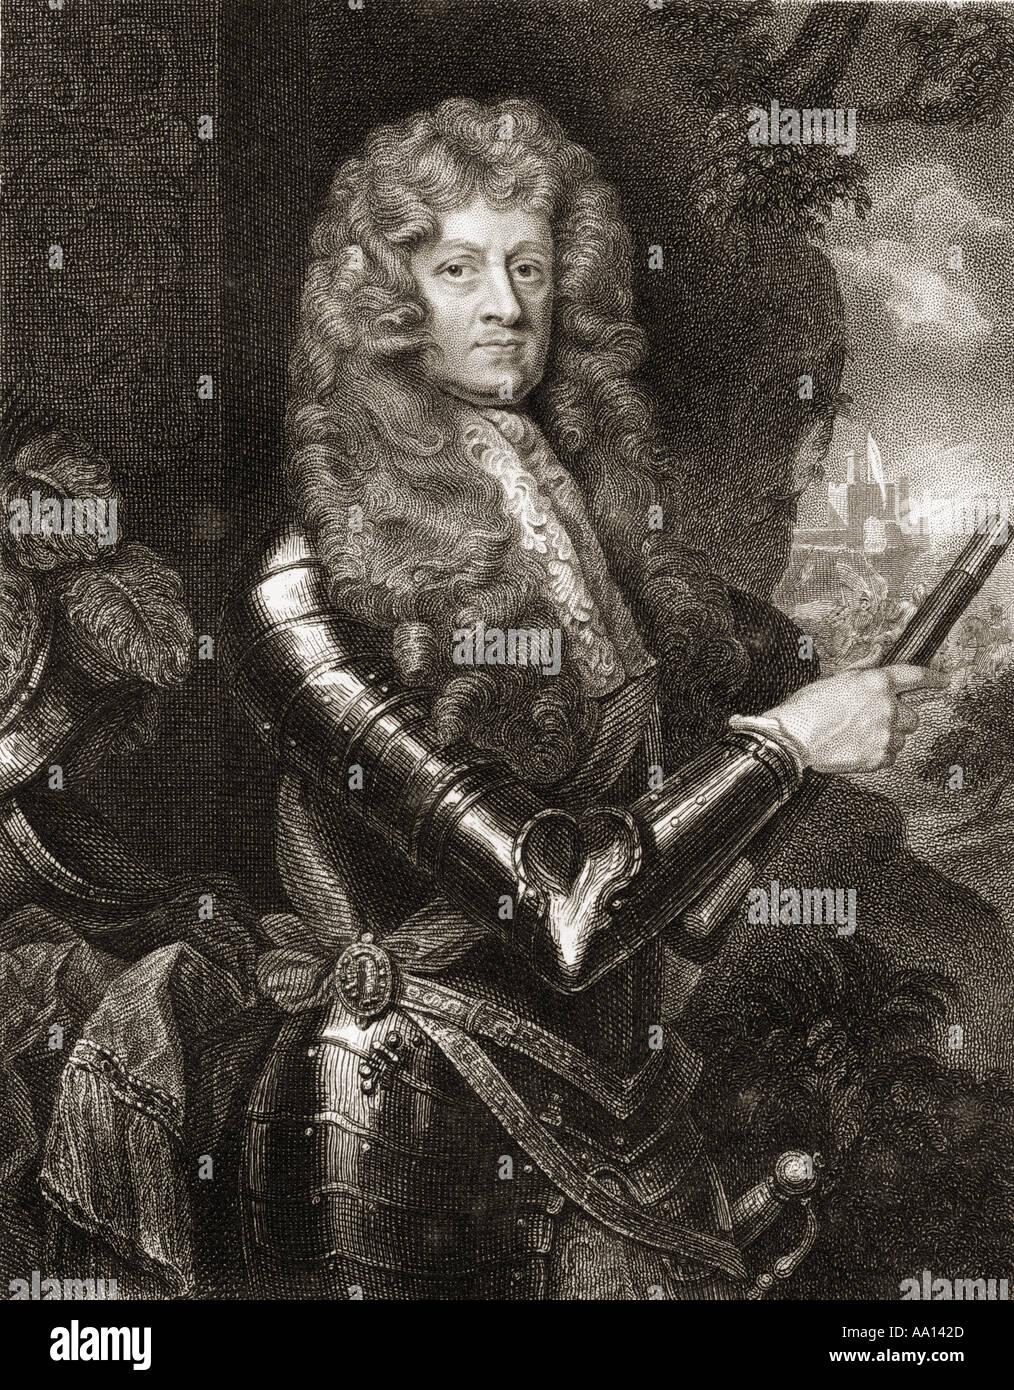 Lieutenant-General James FitzThomas Butler, 1st Duke of Ormond, 1st Marquess of Ormond, 1610 - 1688.  Irish statesman and soldier - Stock Image